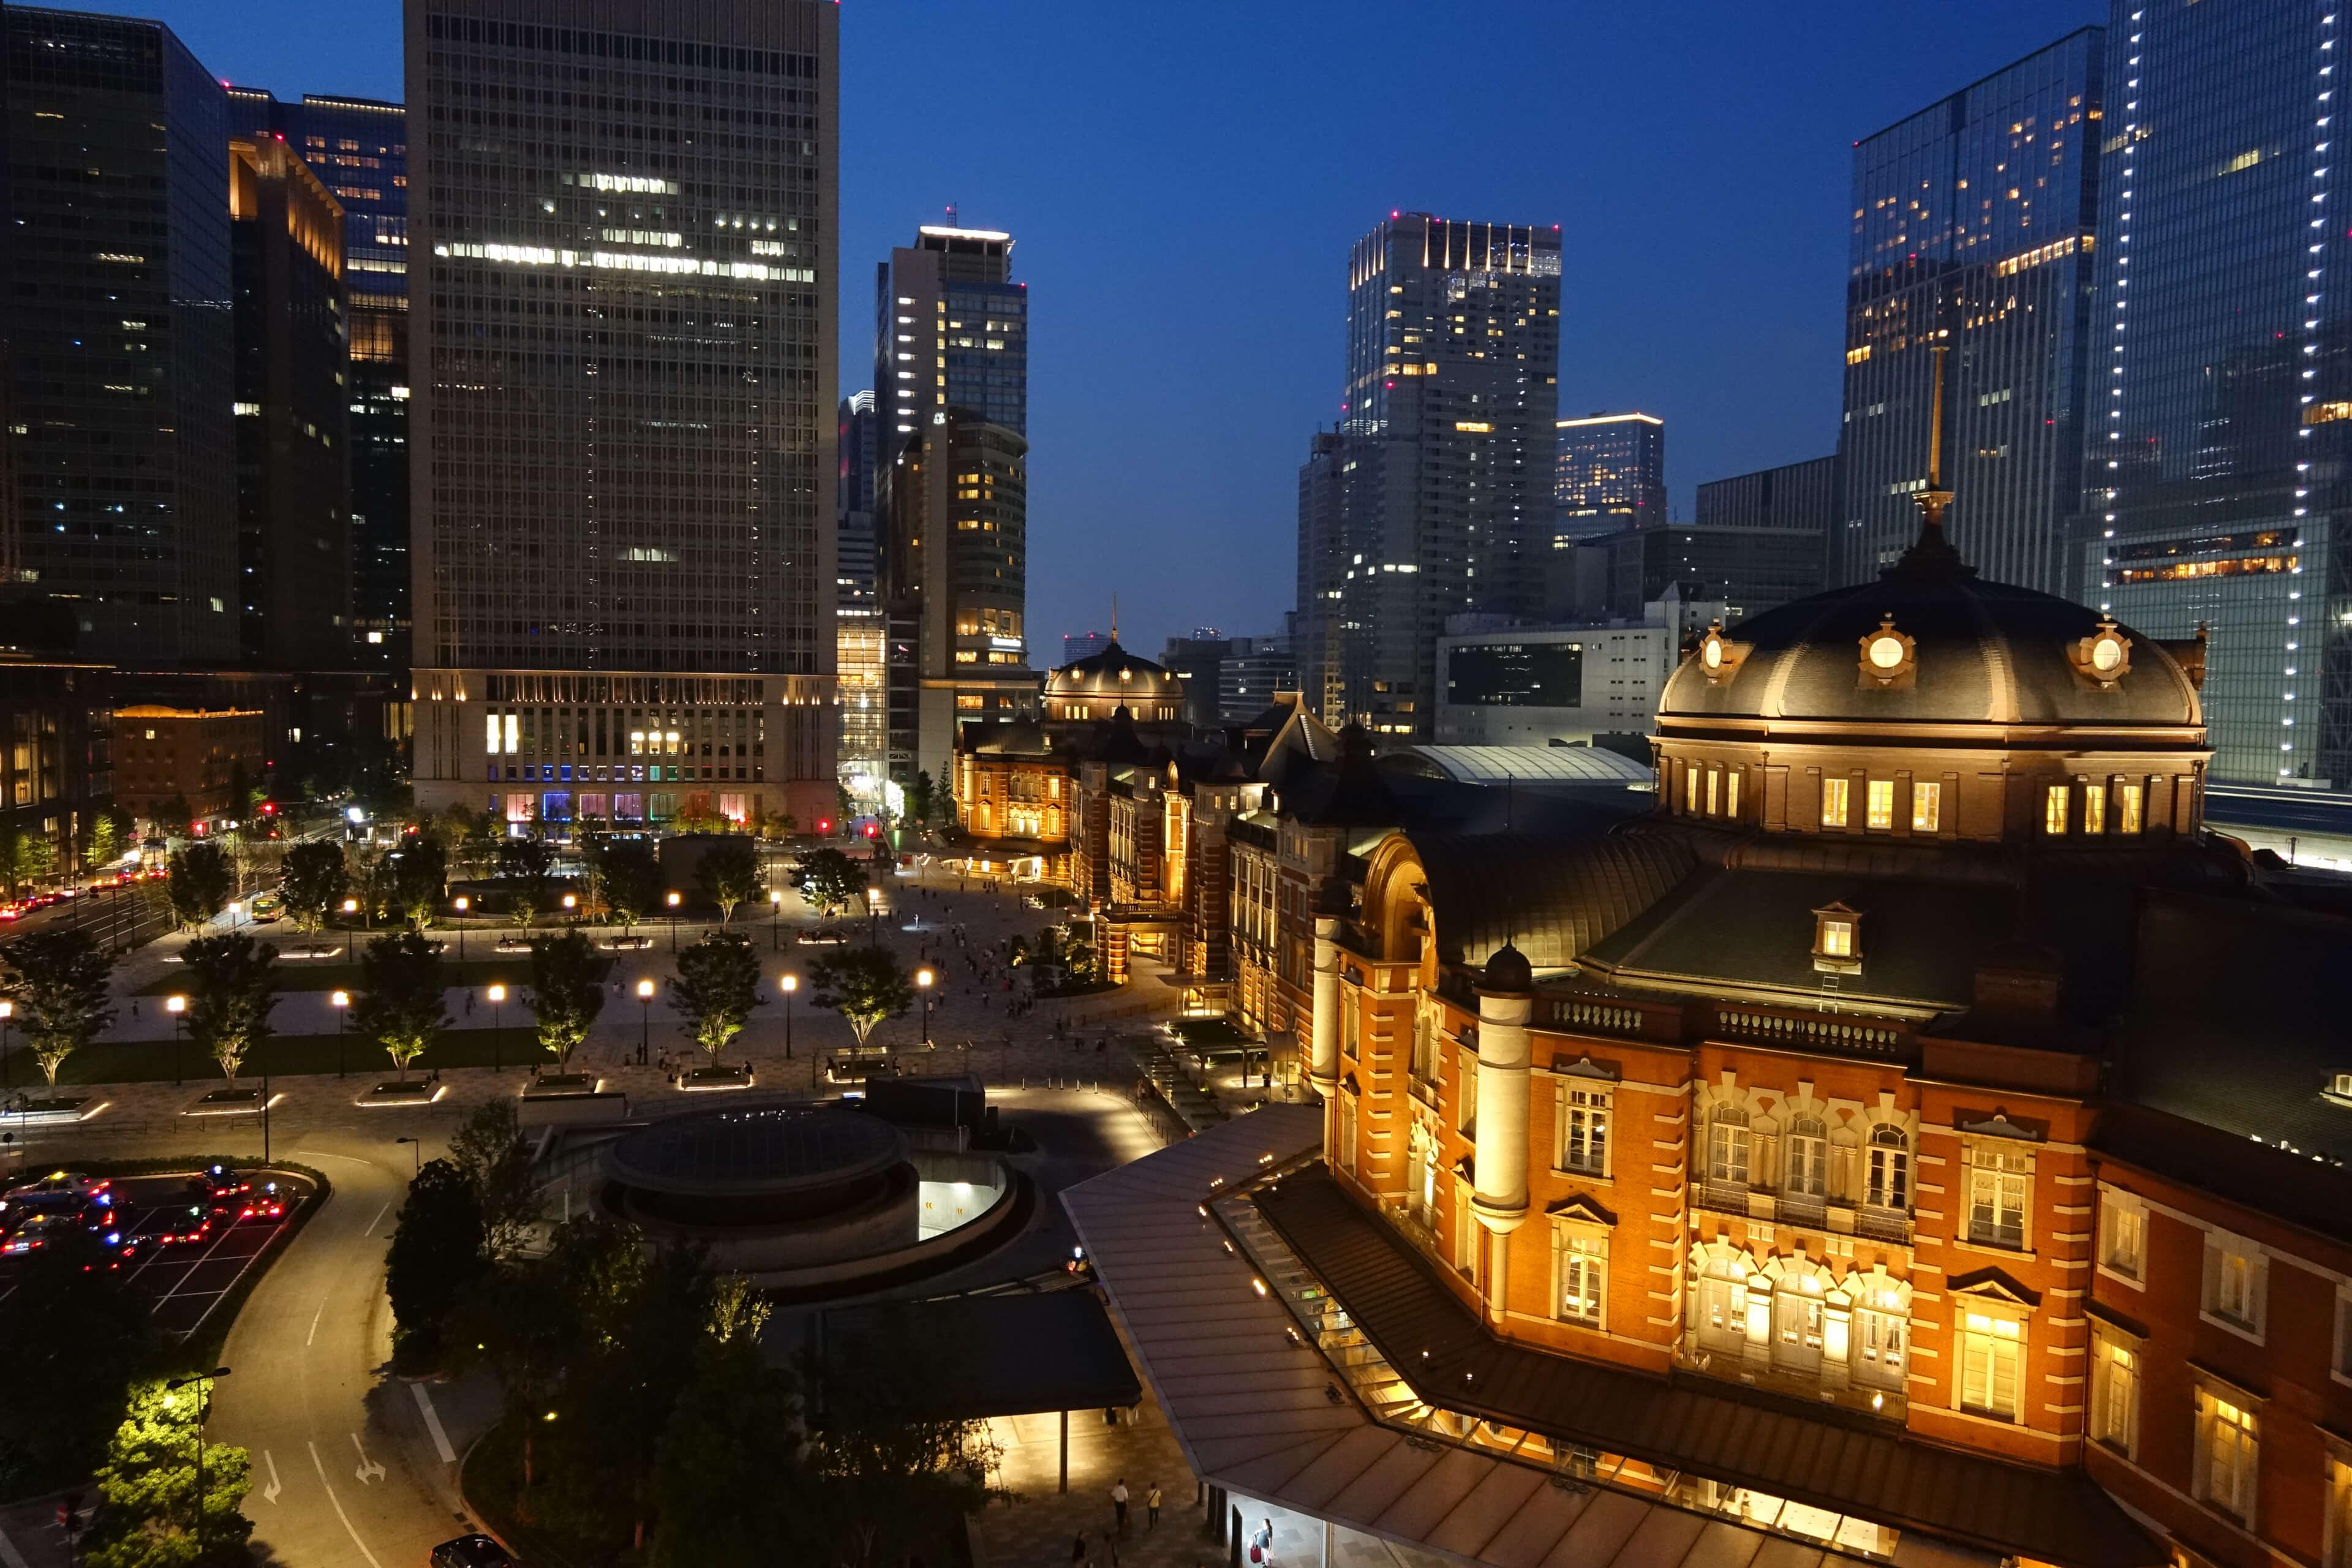 SONY RX0 レビュー 作例 東京駅の夜景